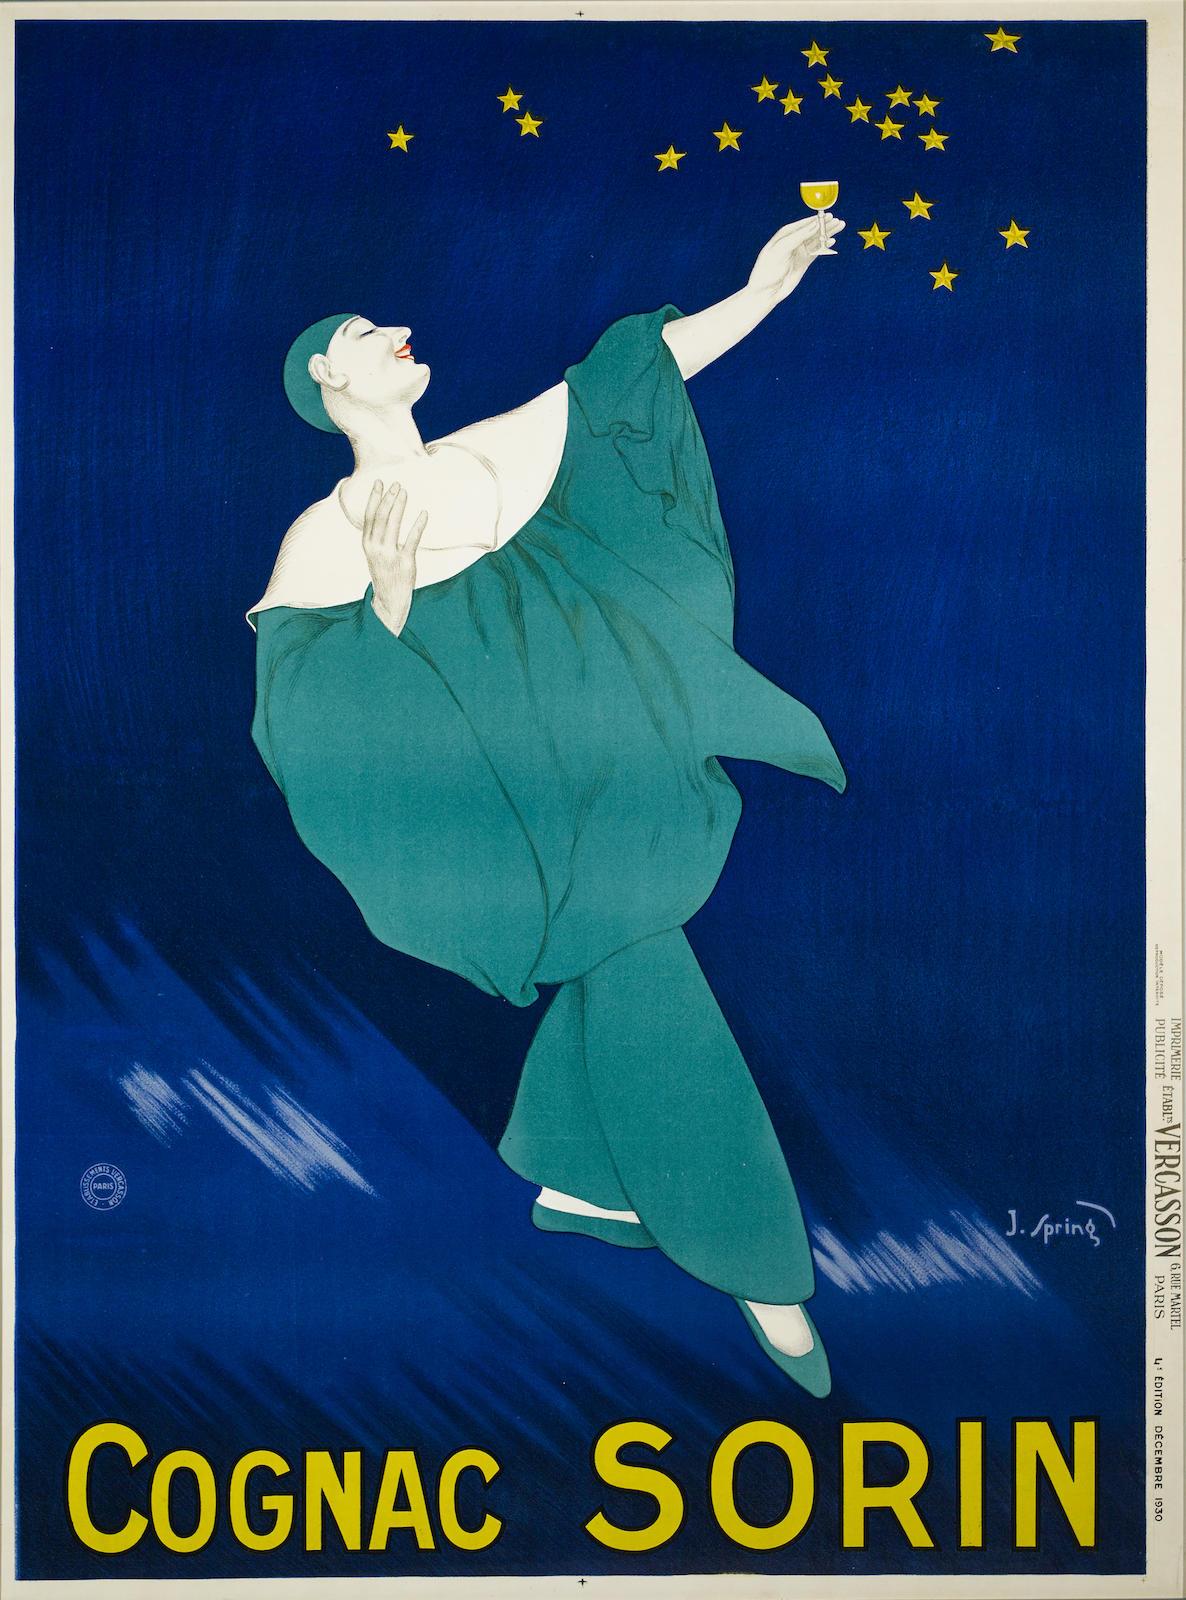 J. Spring - Cognac Sorin, 1930-1930